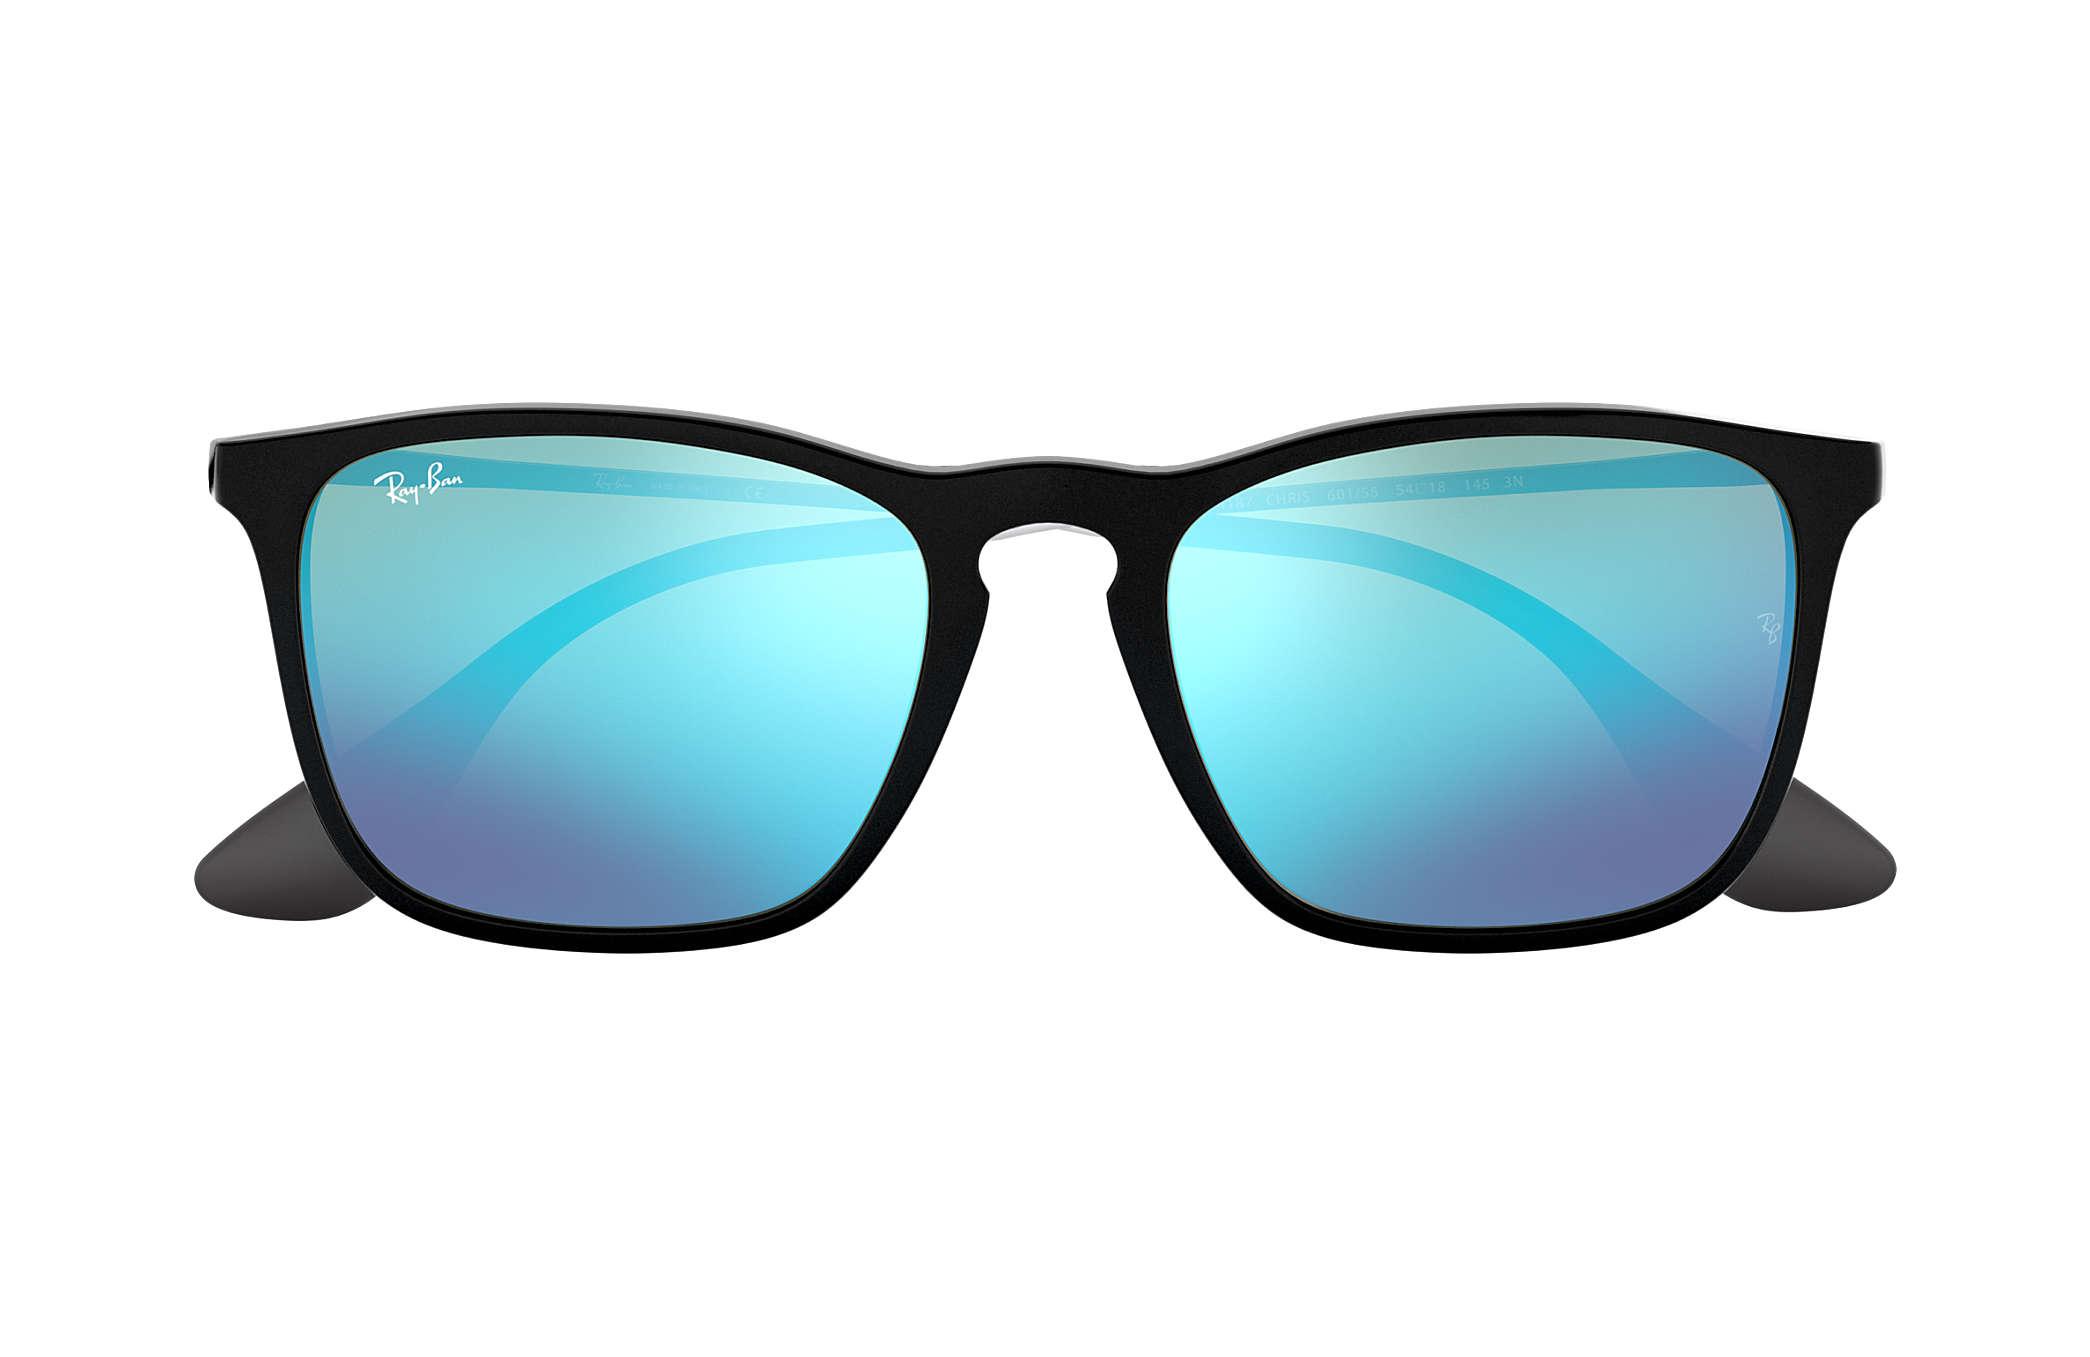 8c90eb8535d Ray-Ban Chris RB4187 Black - Nylon - Blue Lenses - 0RB4187601 5554 ...